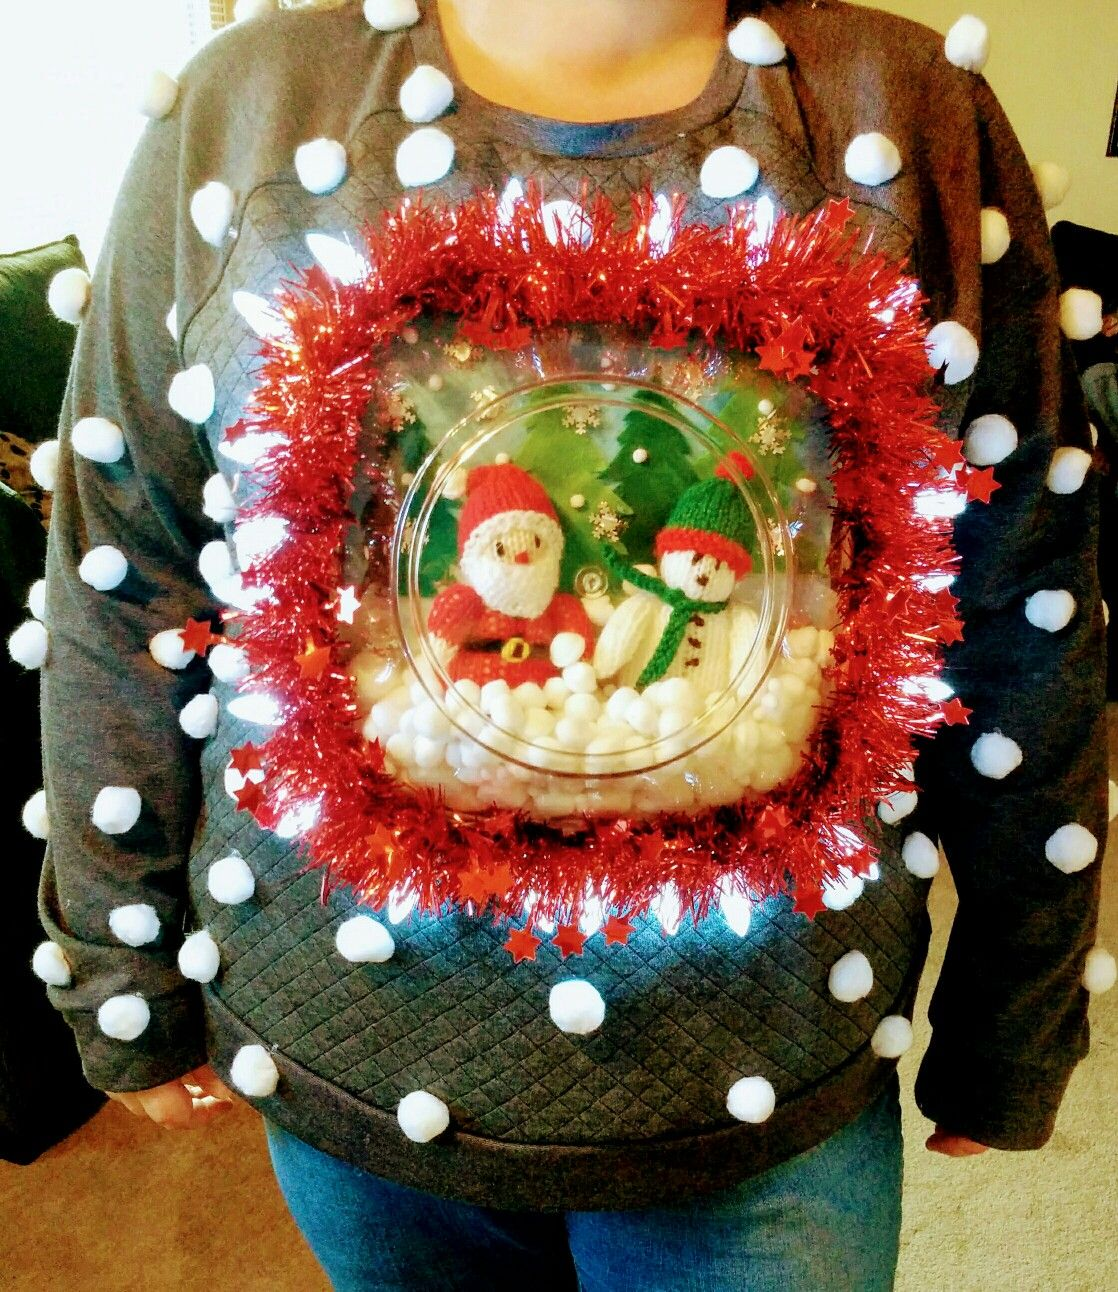 home made ugly festive christmas sweater snow globe. Black Bedroom Furniture Sets. Home Design Ideas